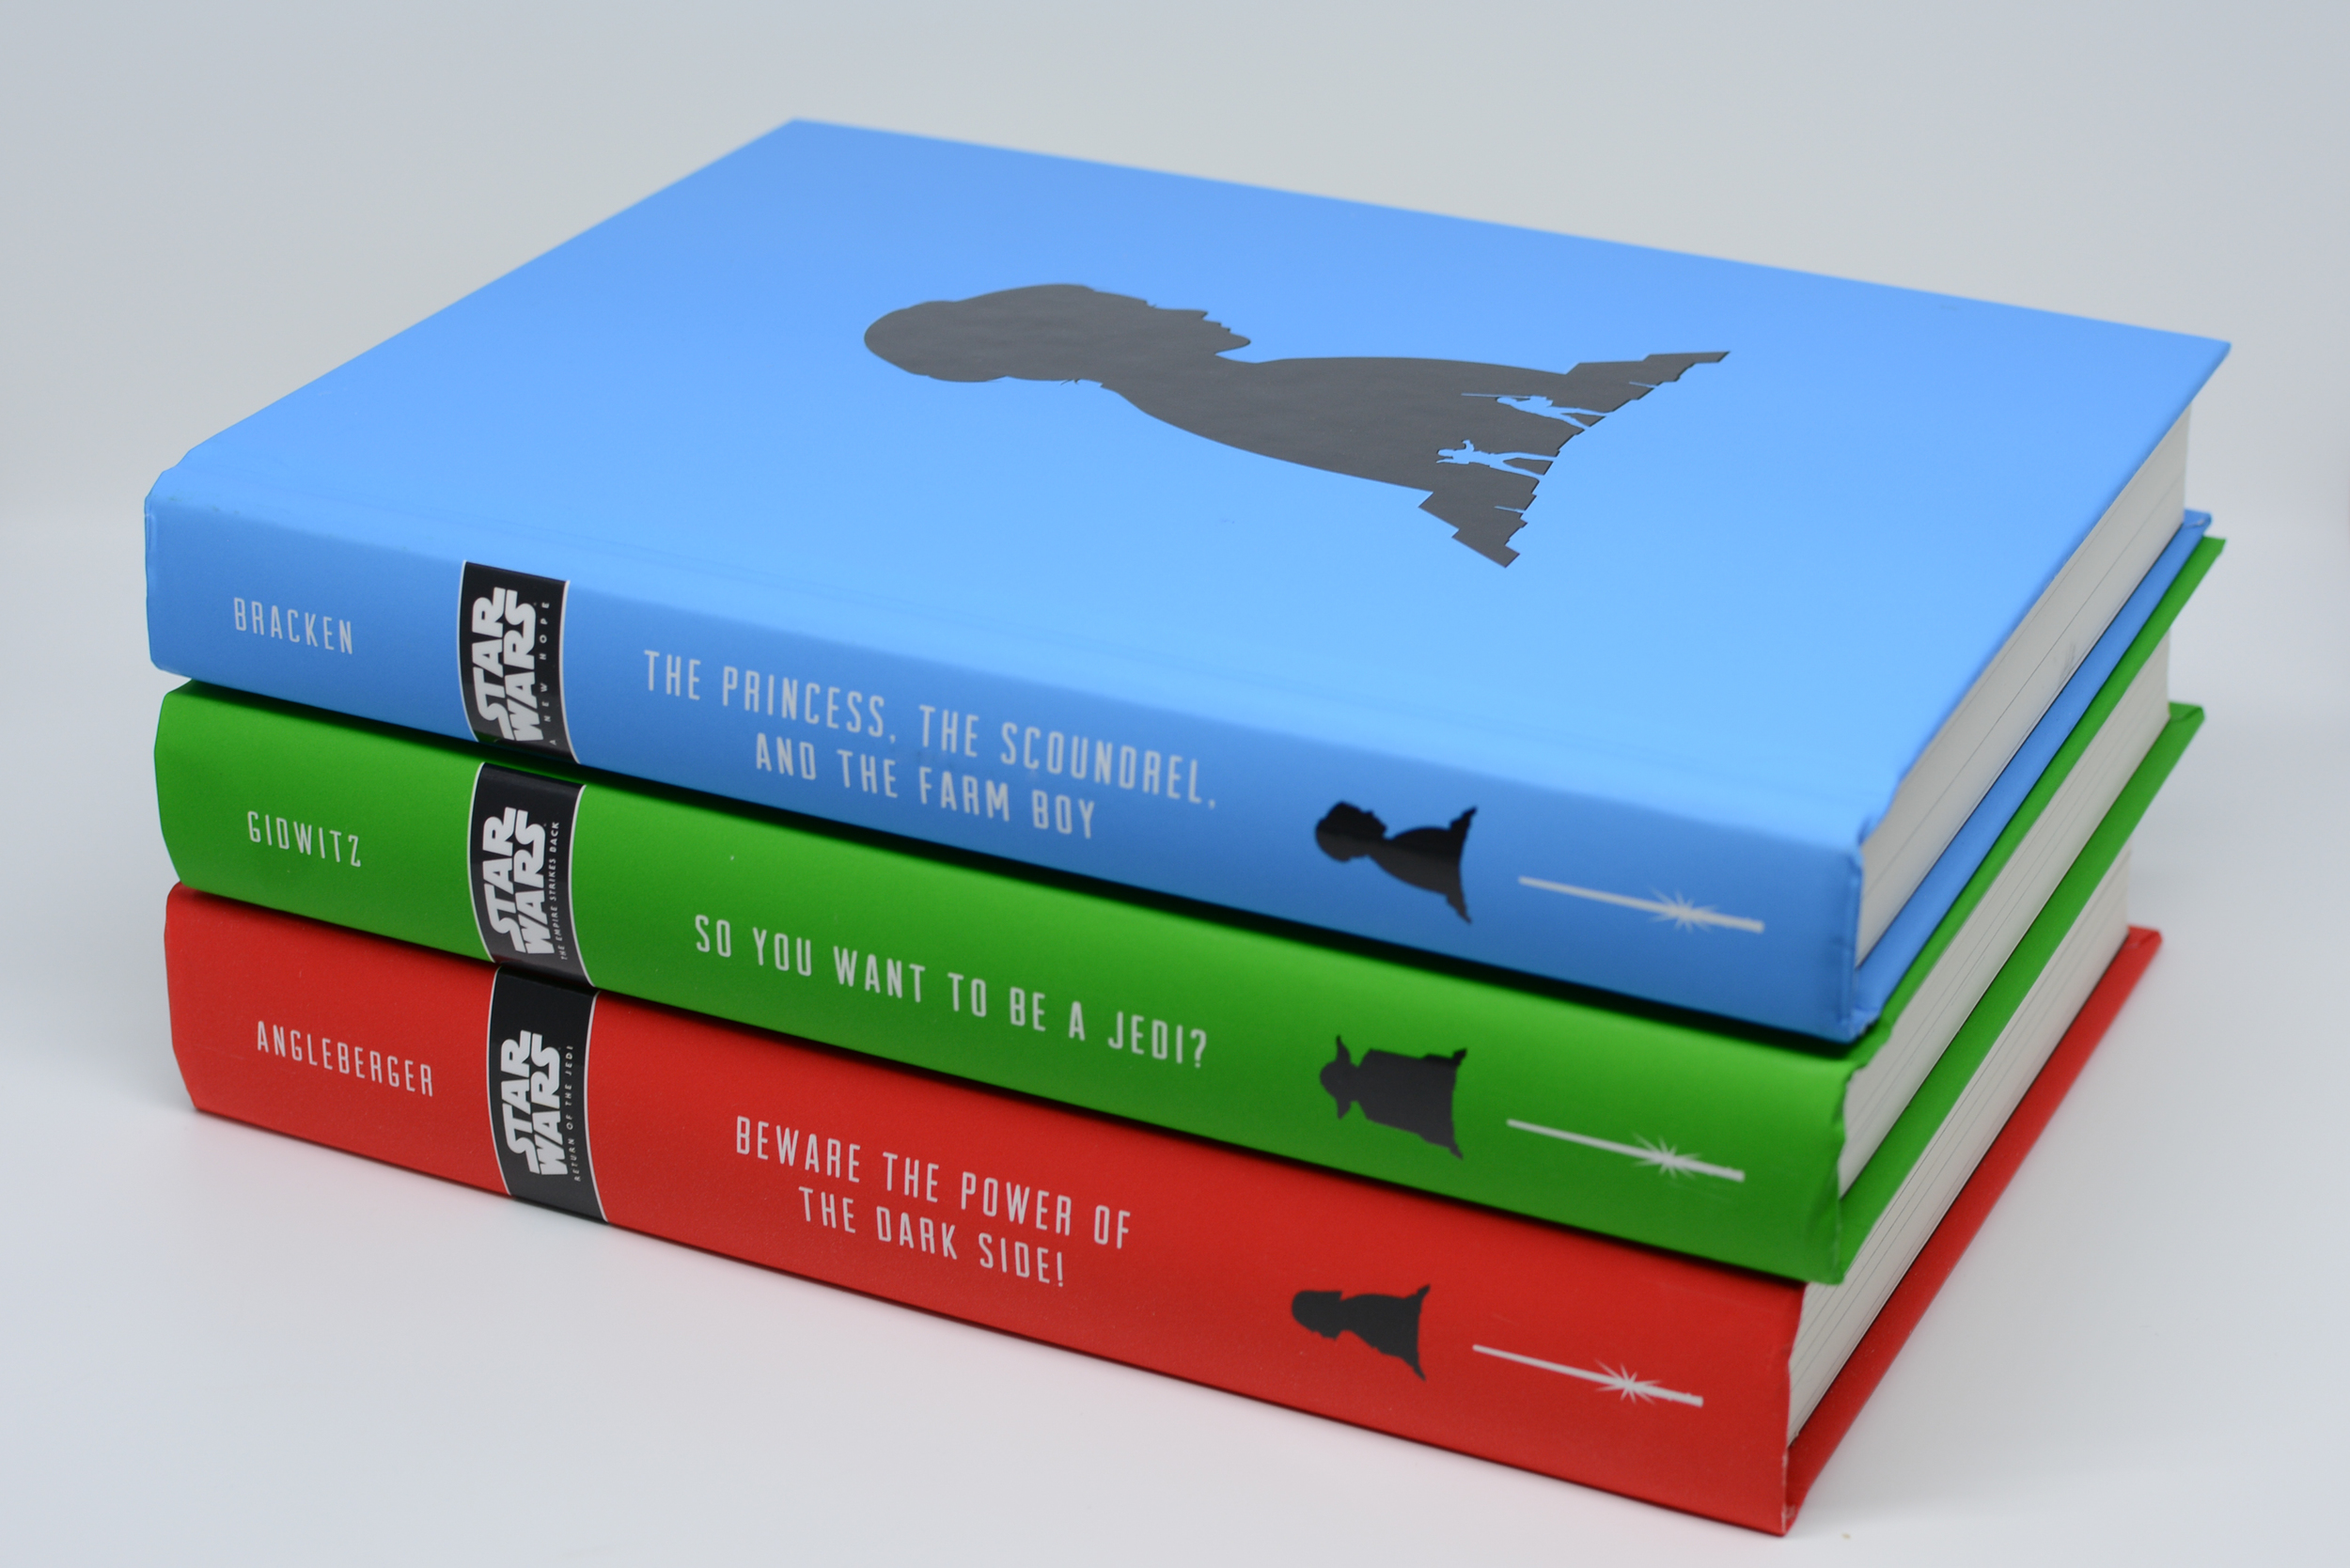 Pam Portfolio Starwars Books-61.jpg